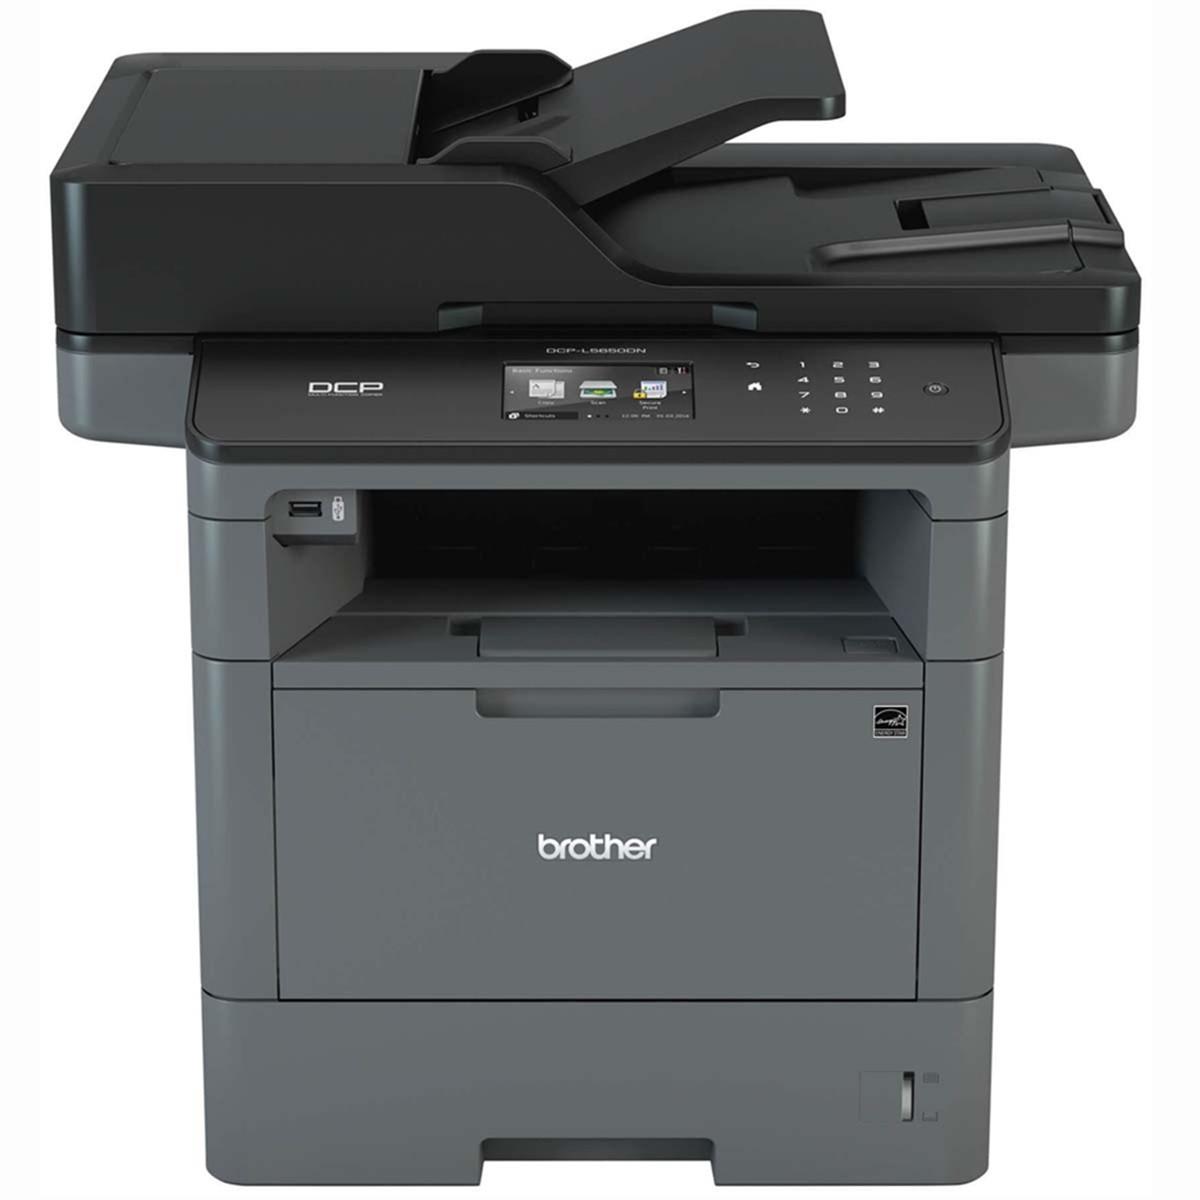 Impressora Brother MFC-L5802DW MFCL5802 Multifuncional Laser Monocromática com Wireless e Duplex